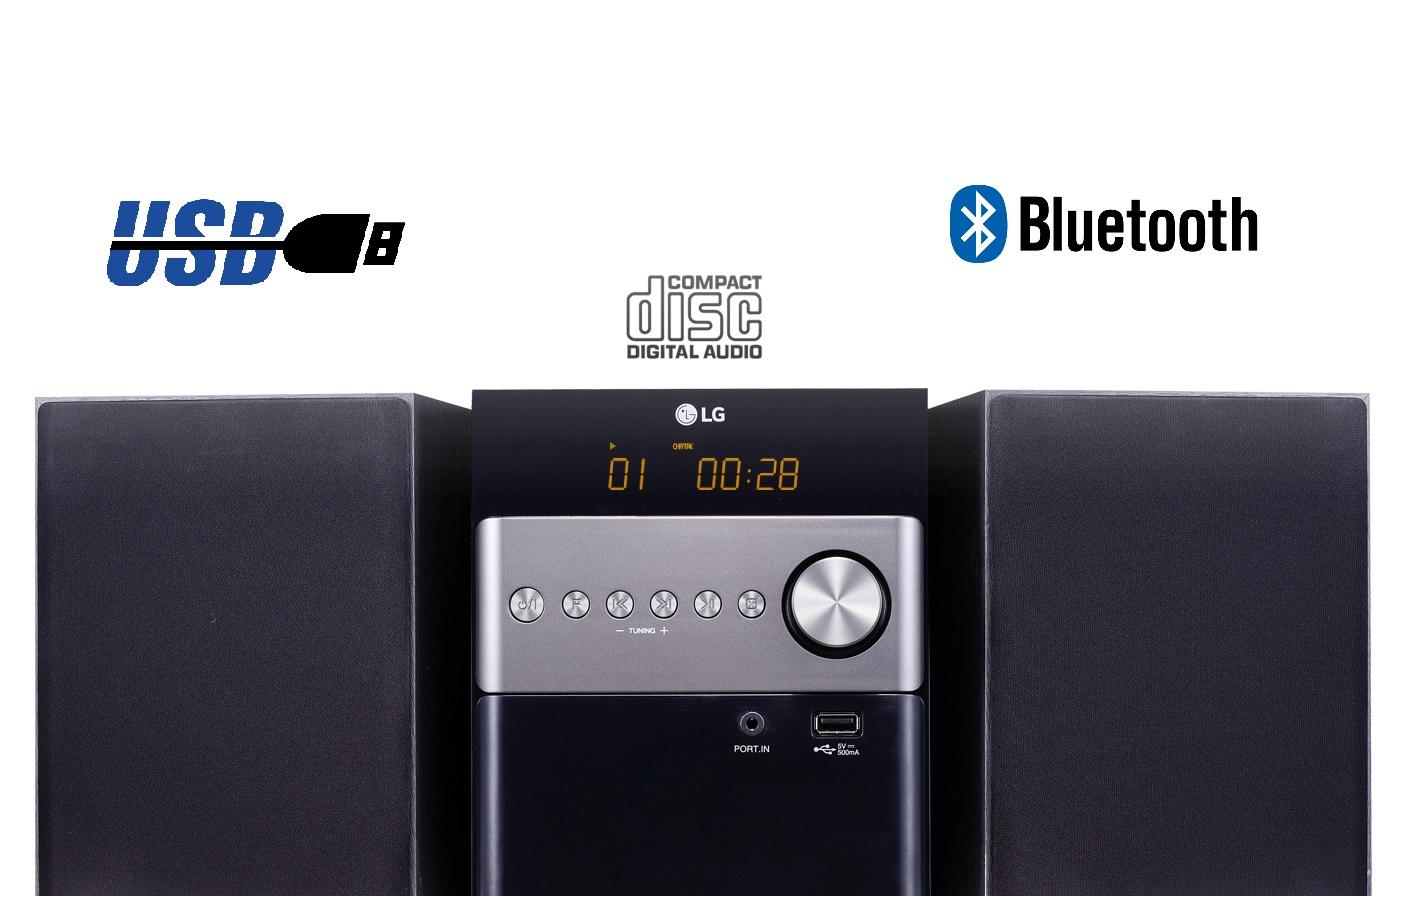 מגניב מערכת סטריאו מיני ביתי USB | מערכת סטריאו ביתית בלוטוס LG CM1560 PL-06